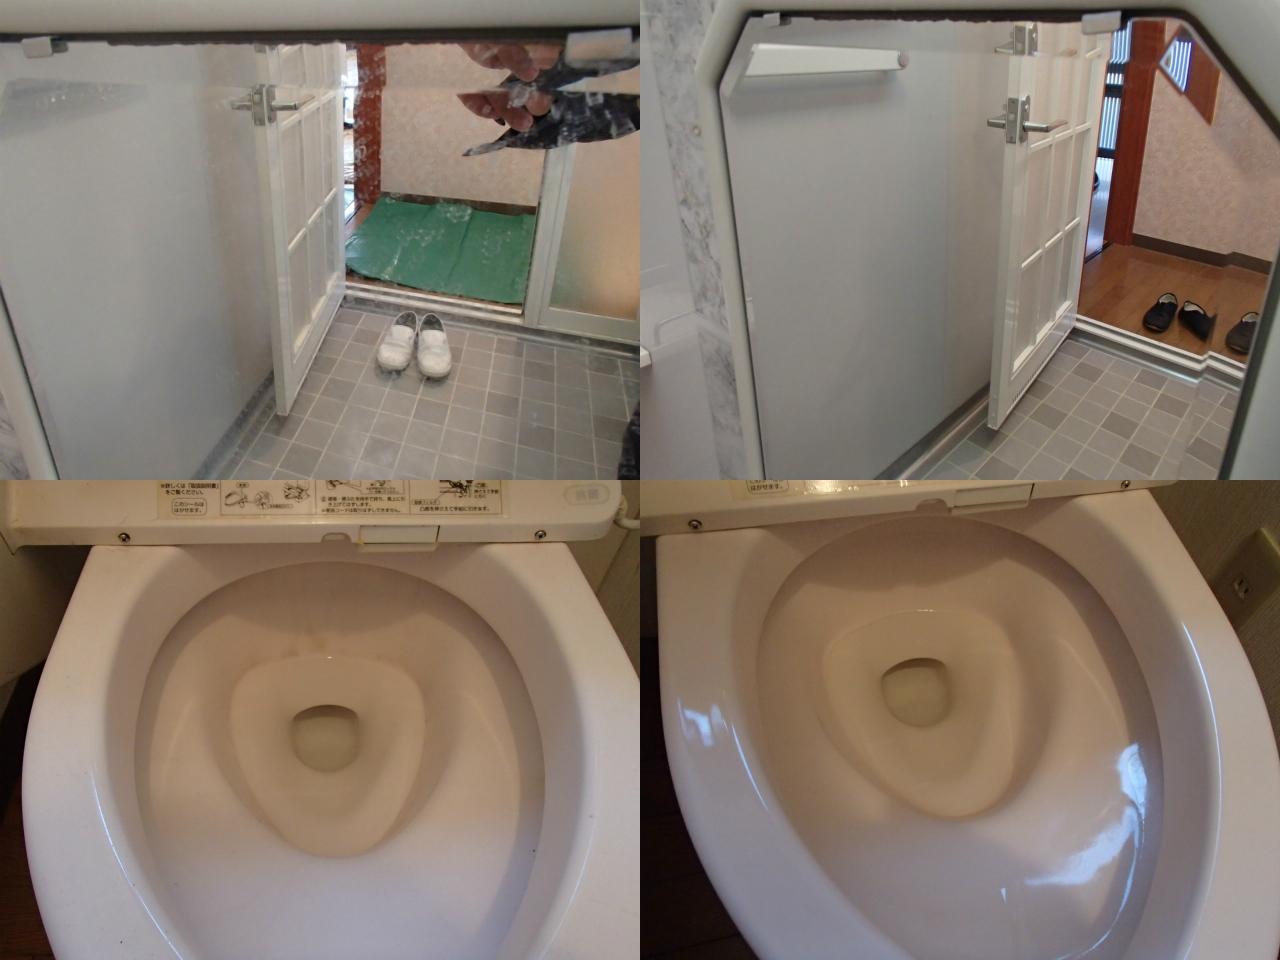 http://ajras.net/images/130108-toilet.jpg